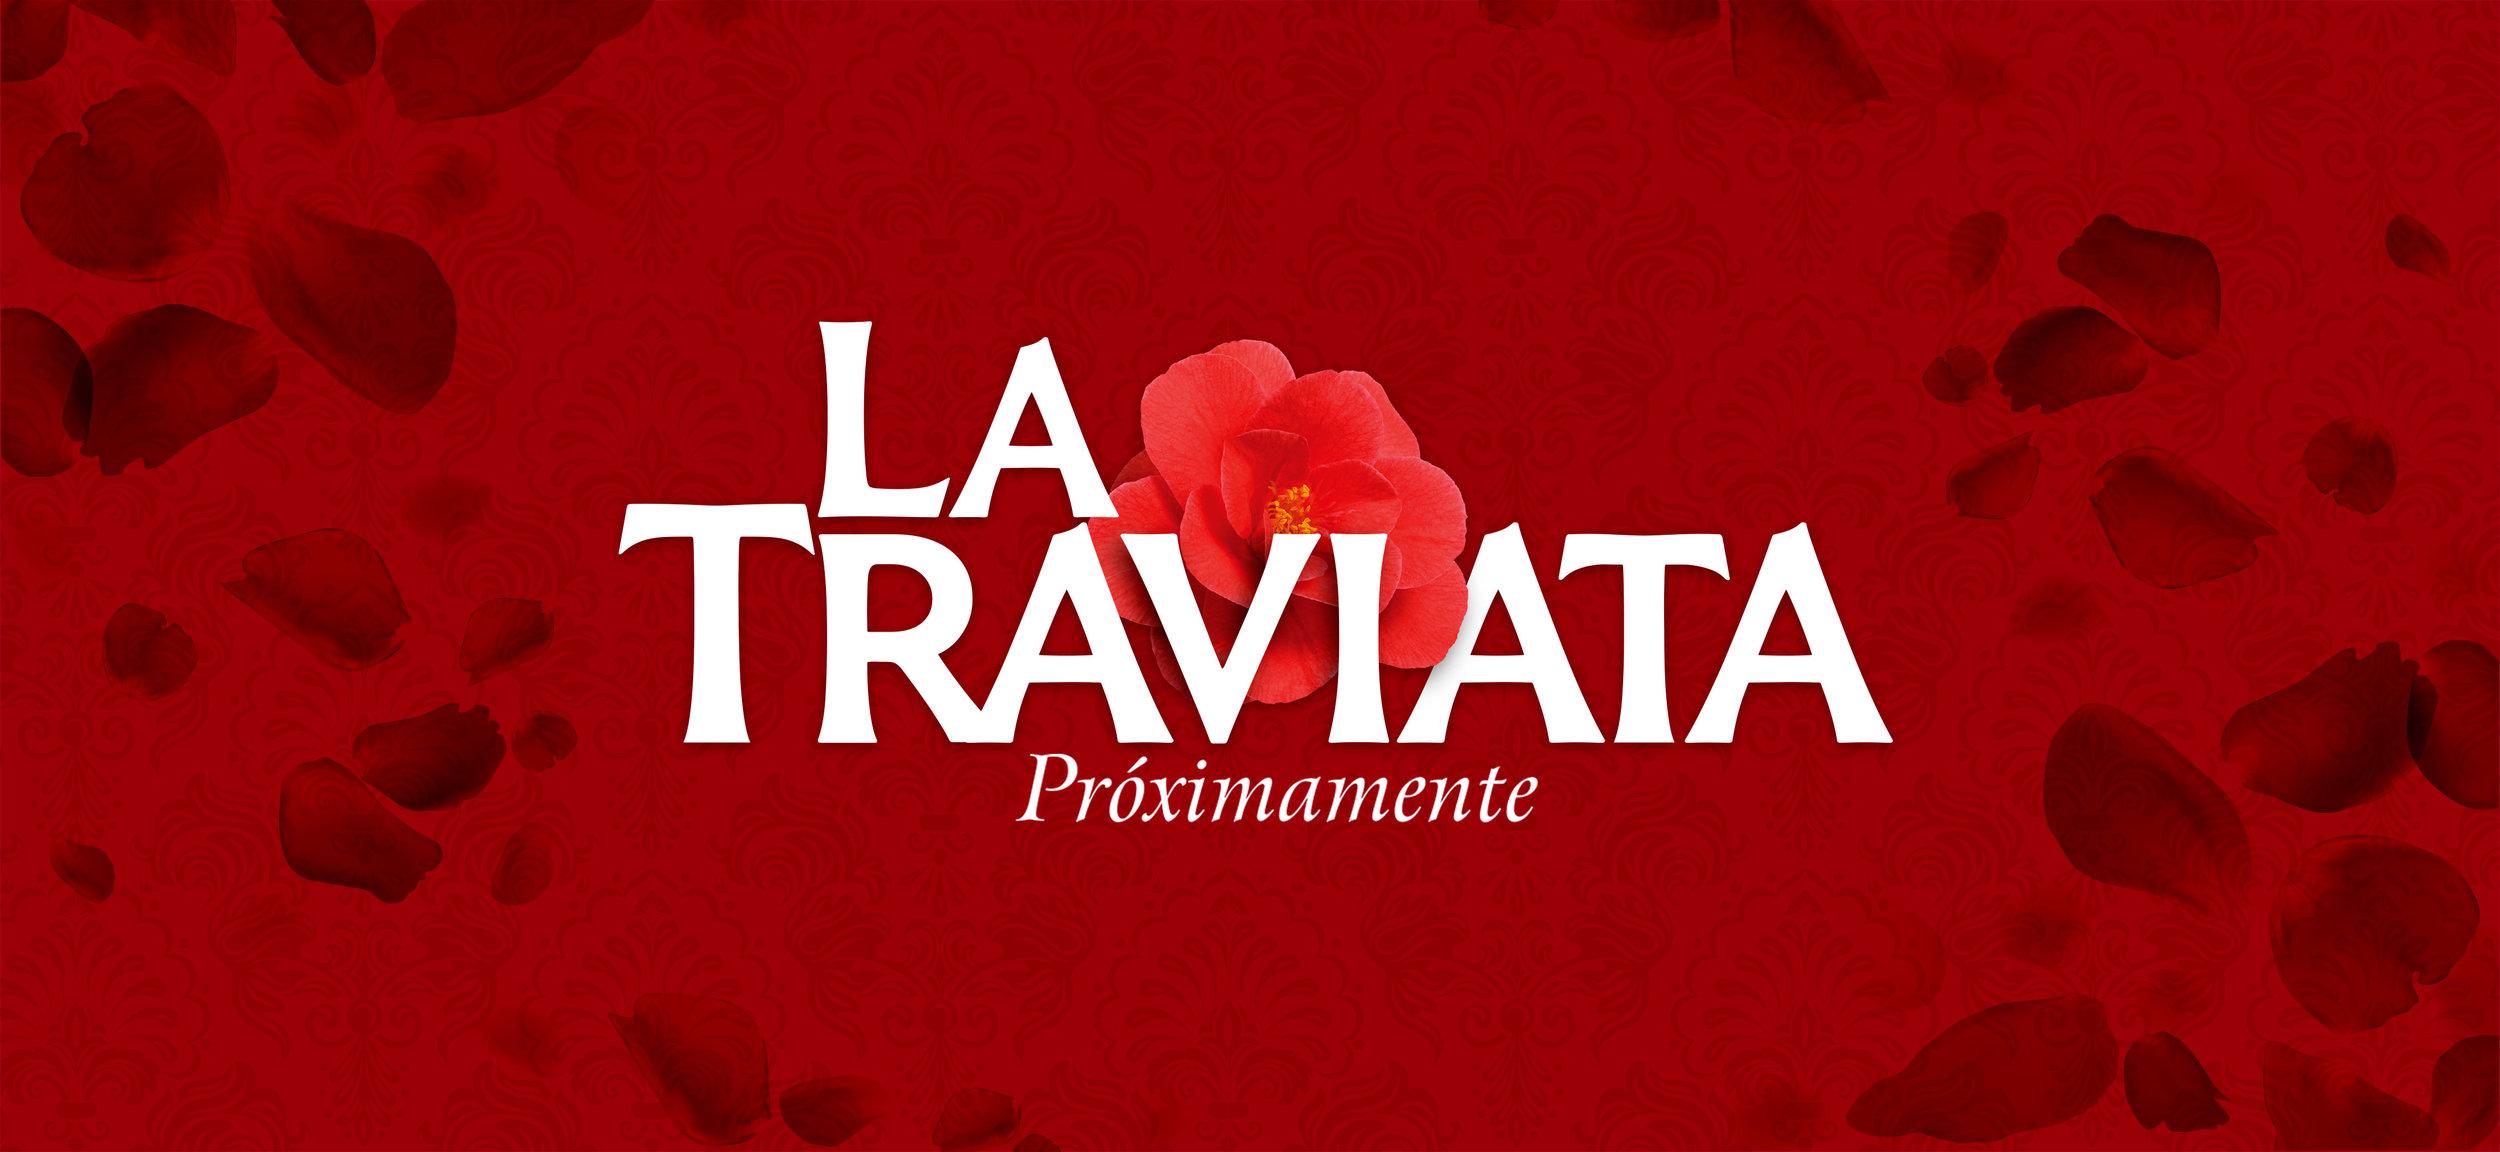 traviatasoon3.jpg